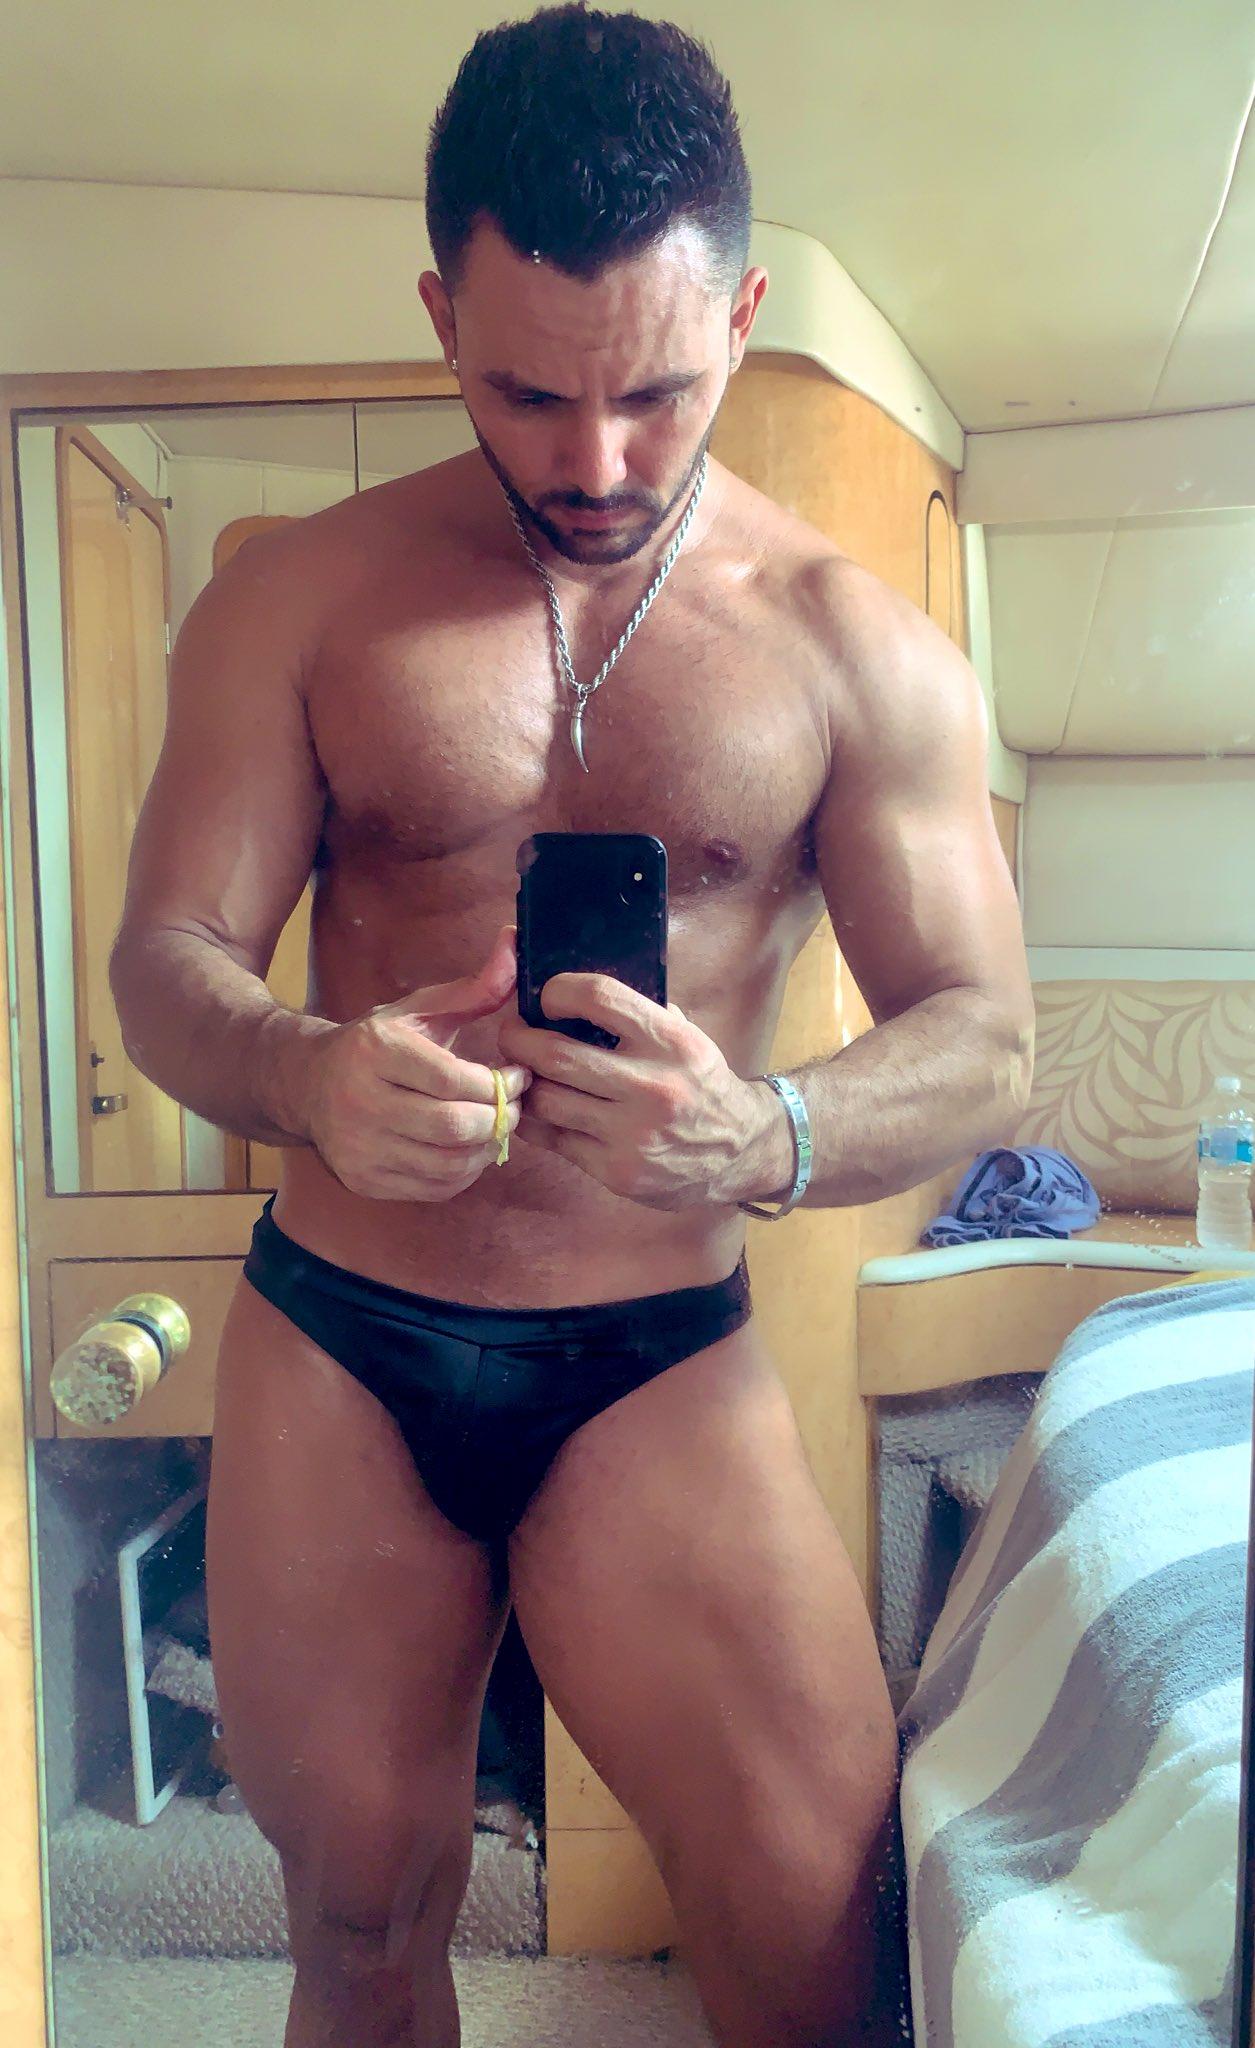 stripper quitándose la ropa